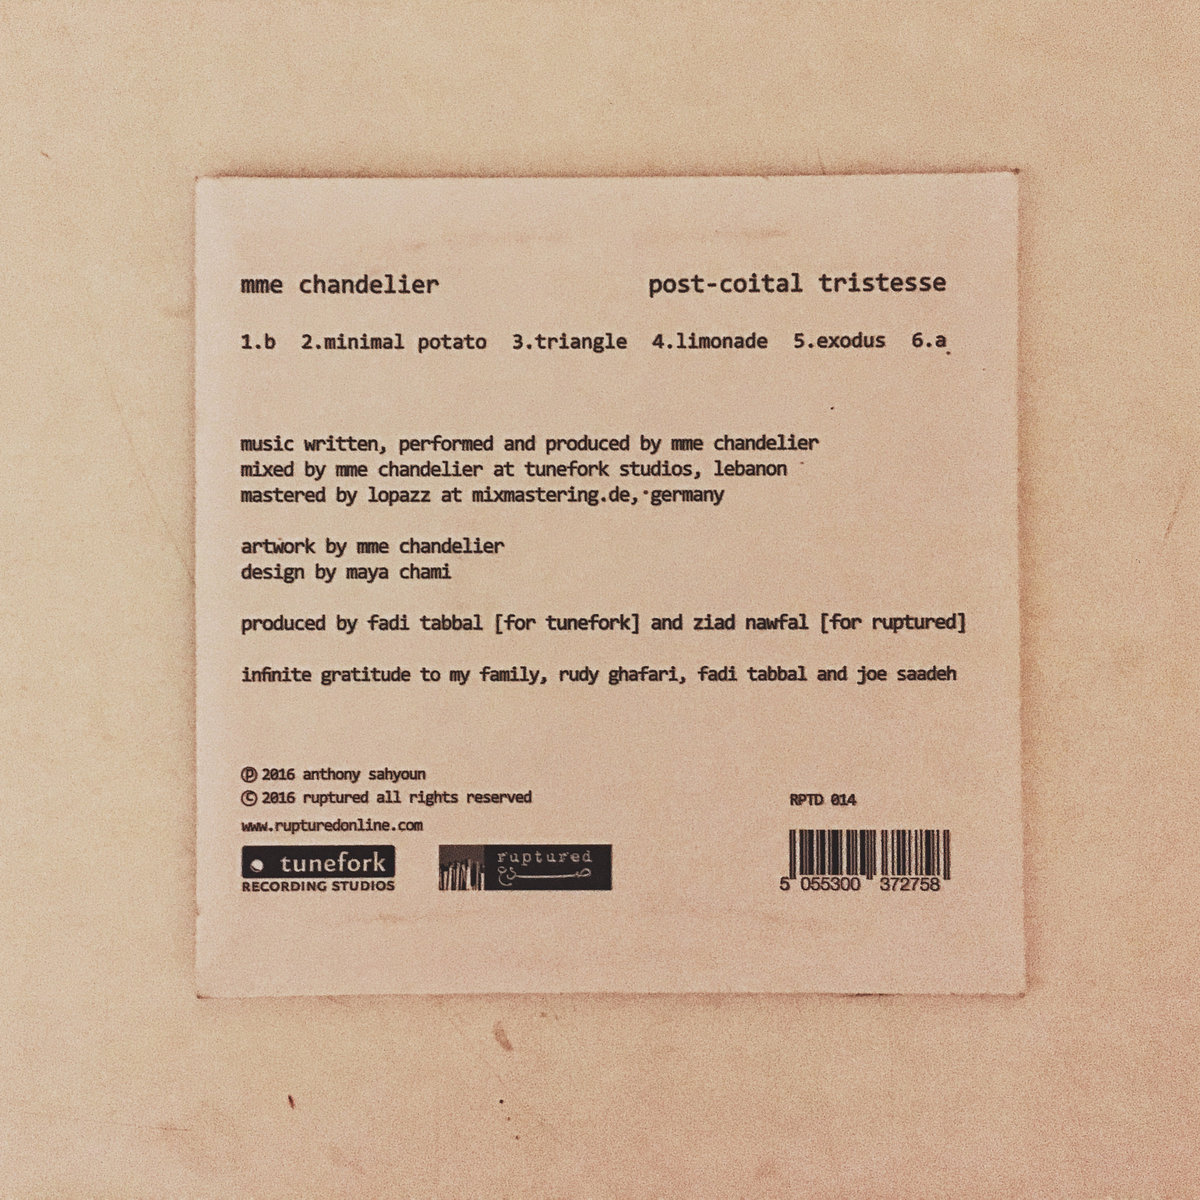 Post-Coital Tristesse | Ruptured Records